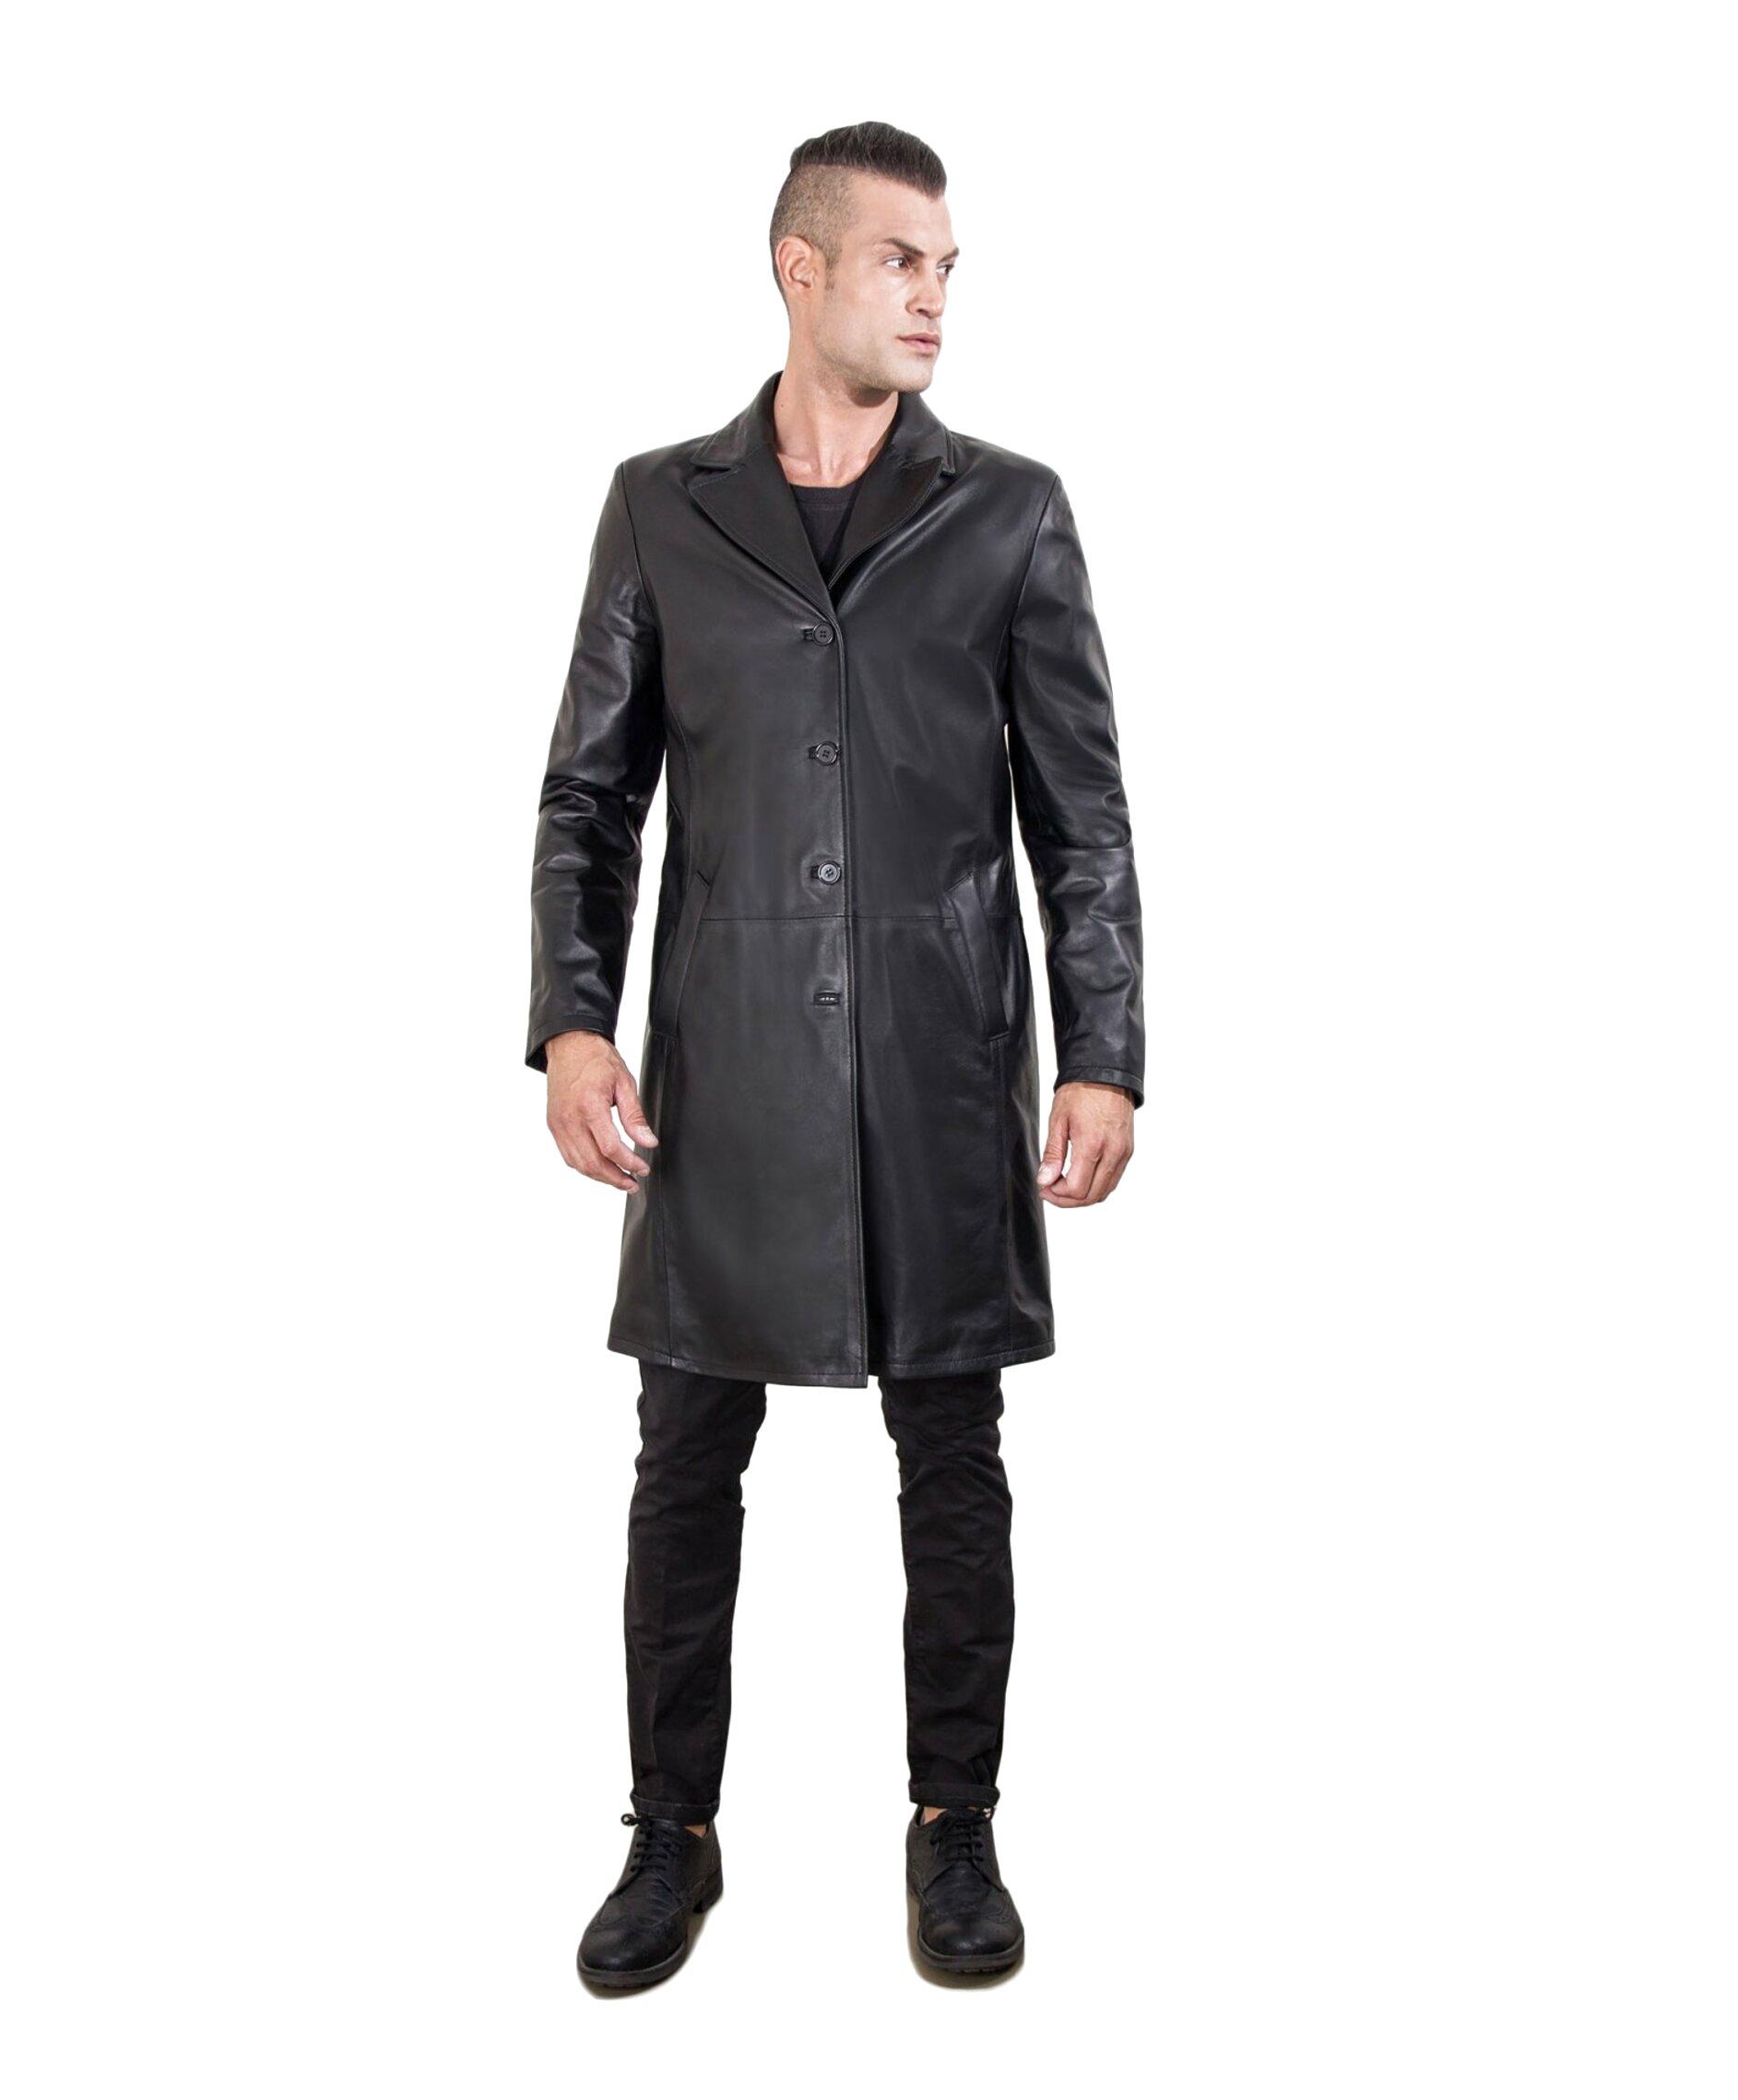 giacca pelle uomo lunga usato